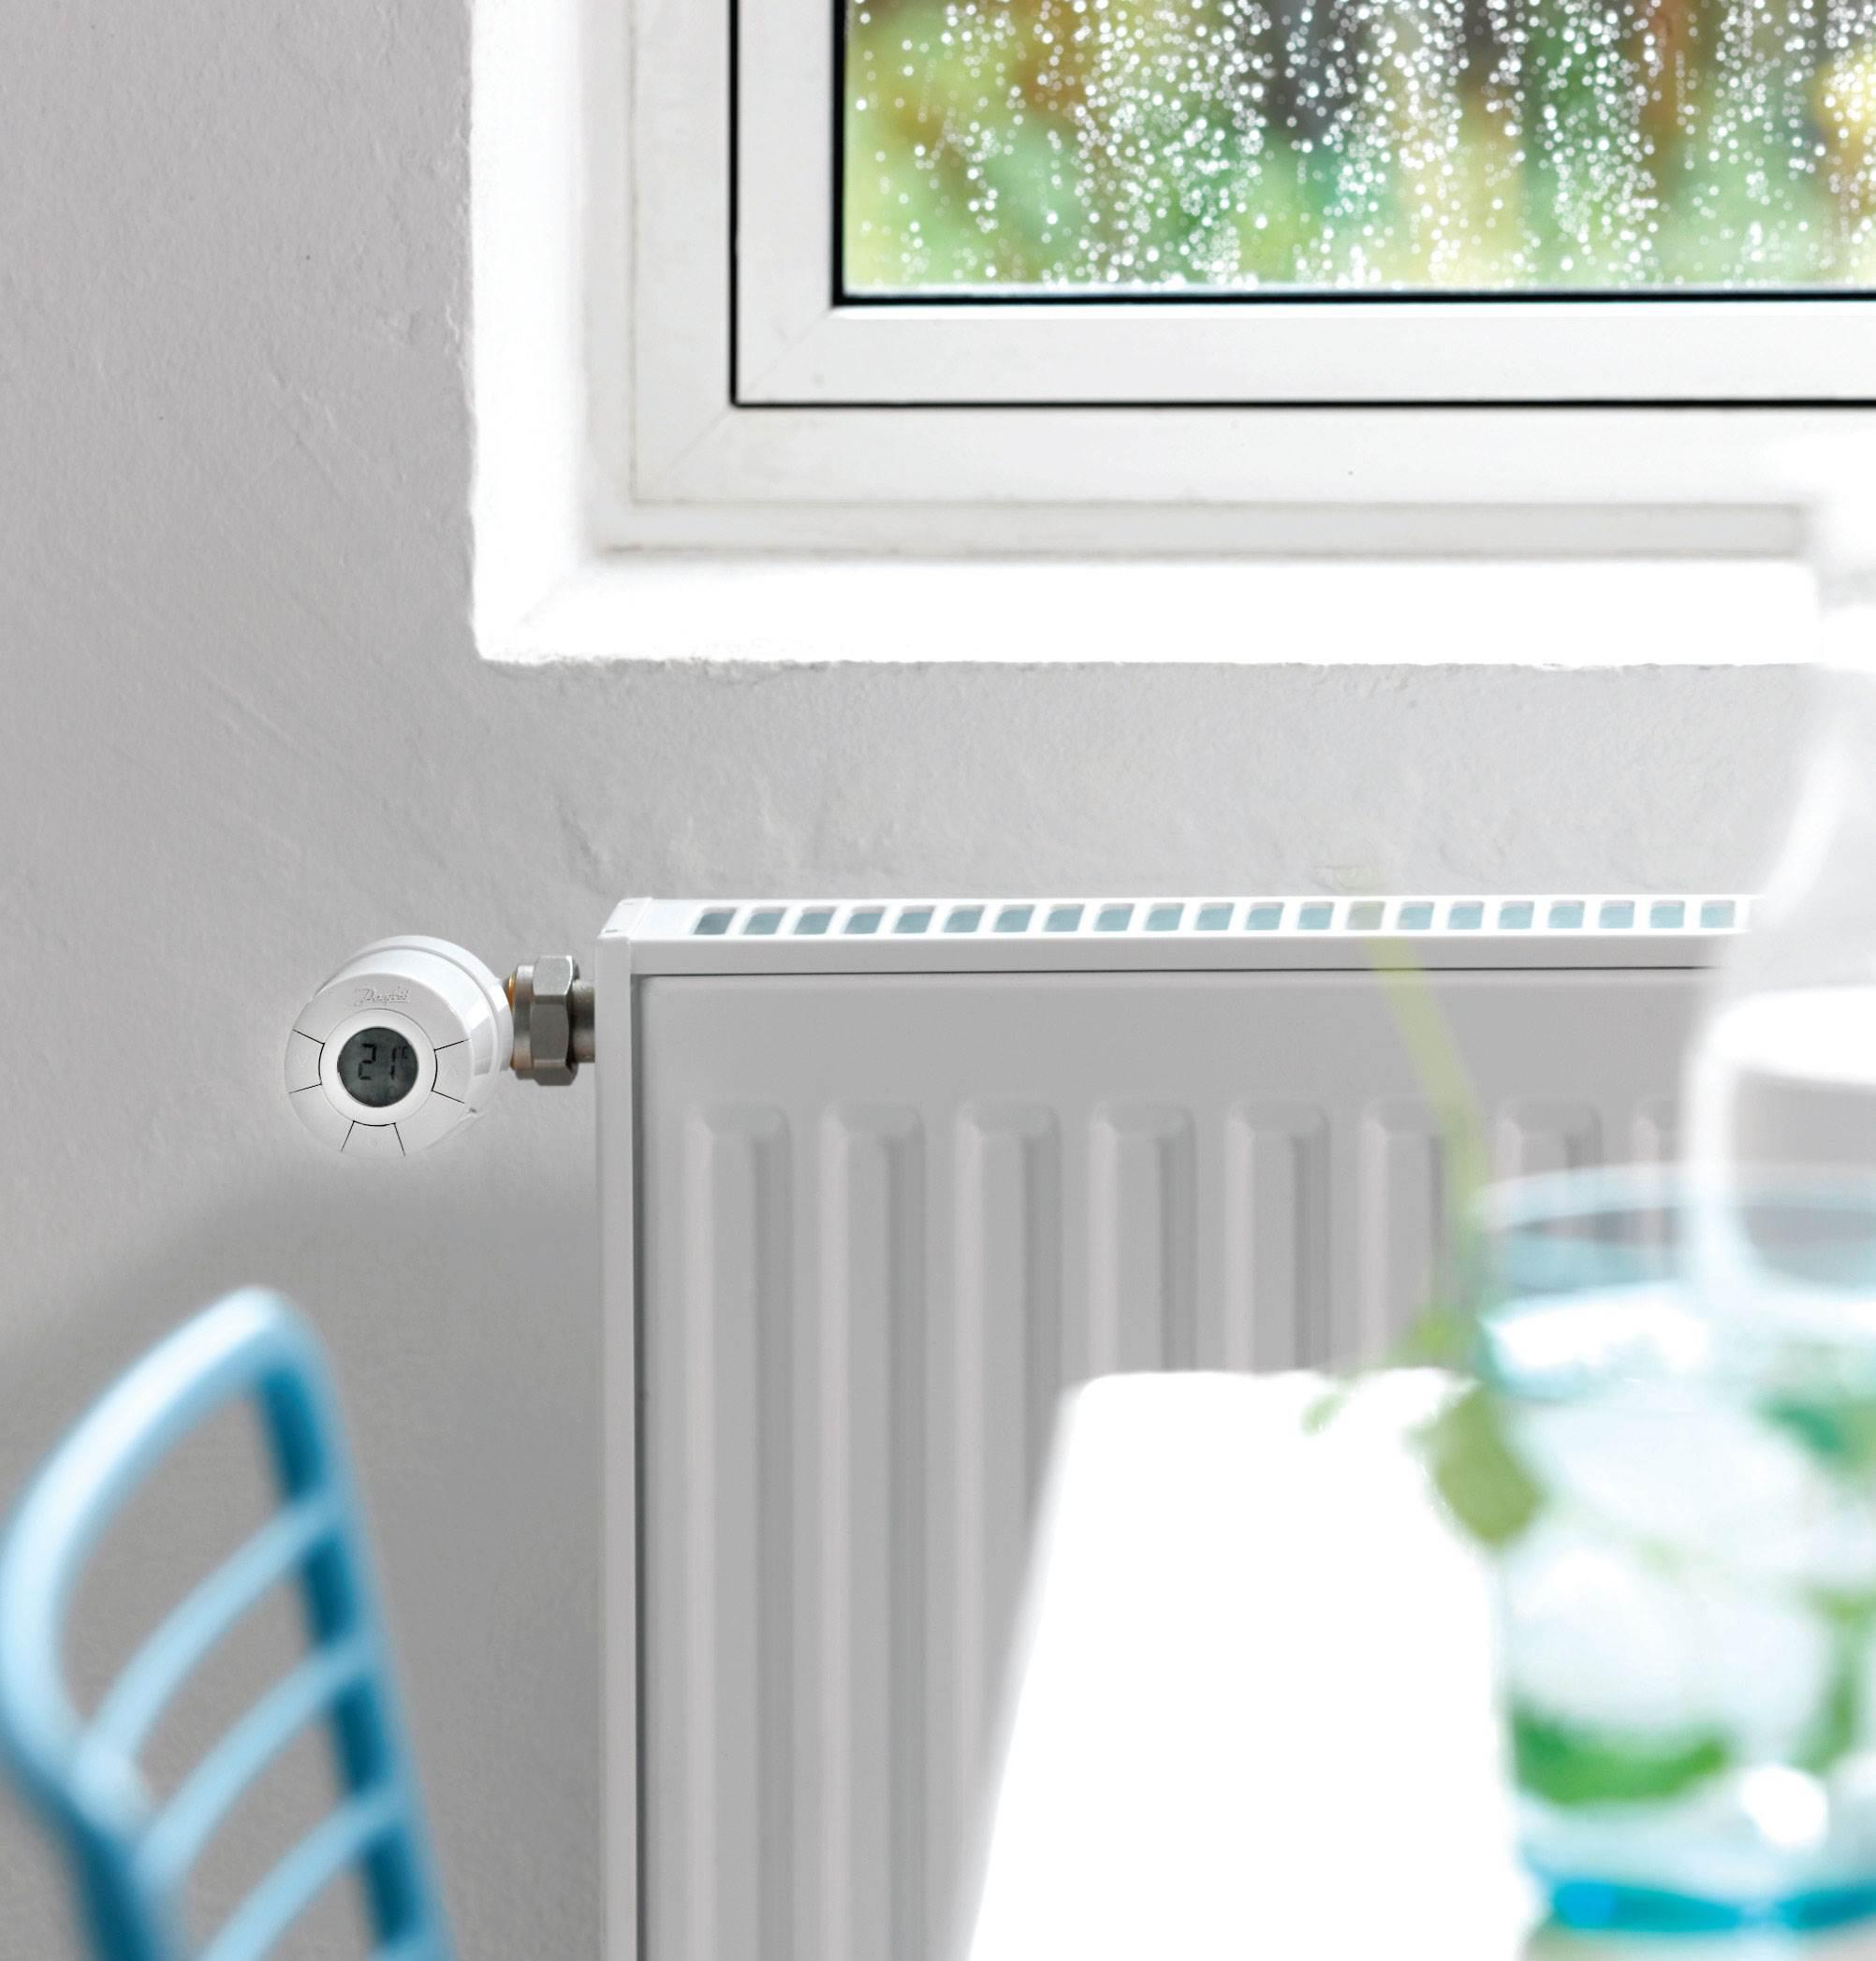 zawory termostatyczne - Zawory termostatyczne